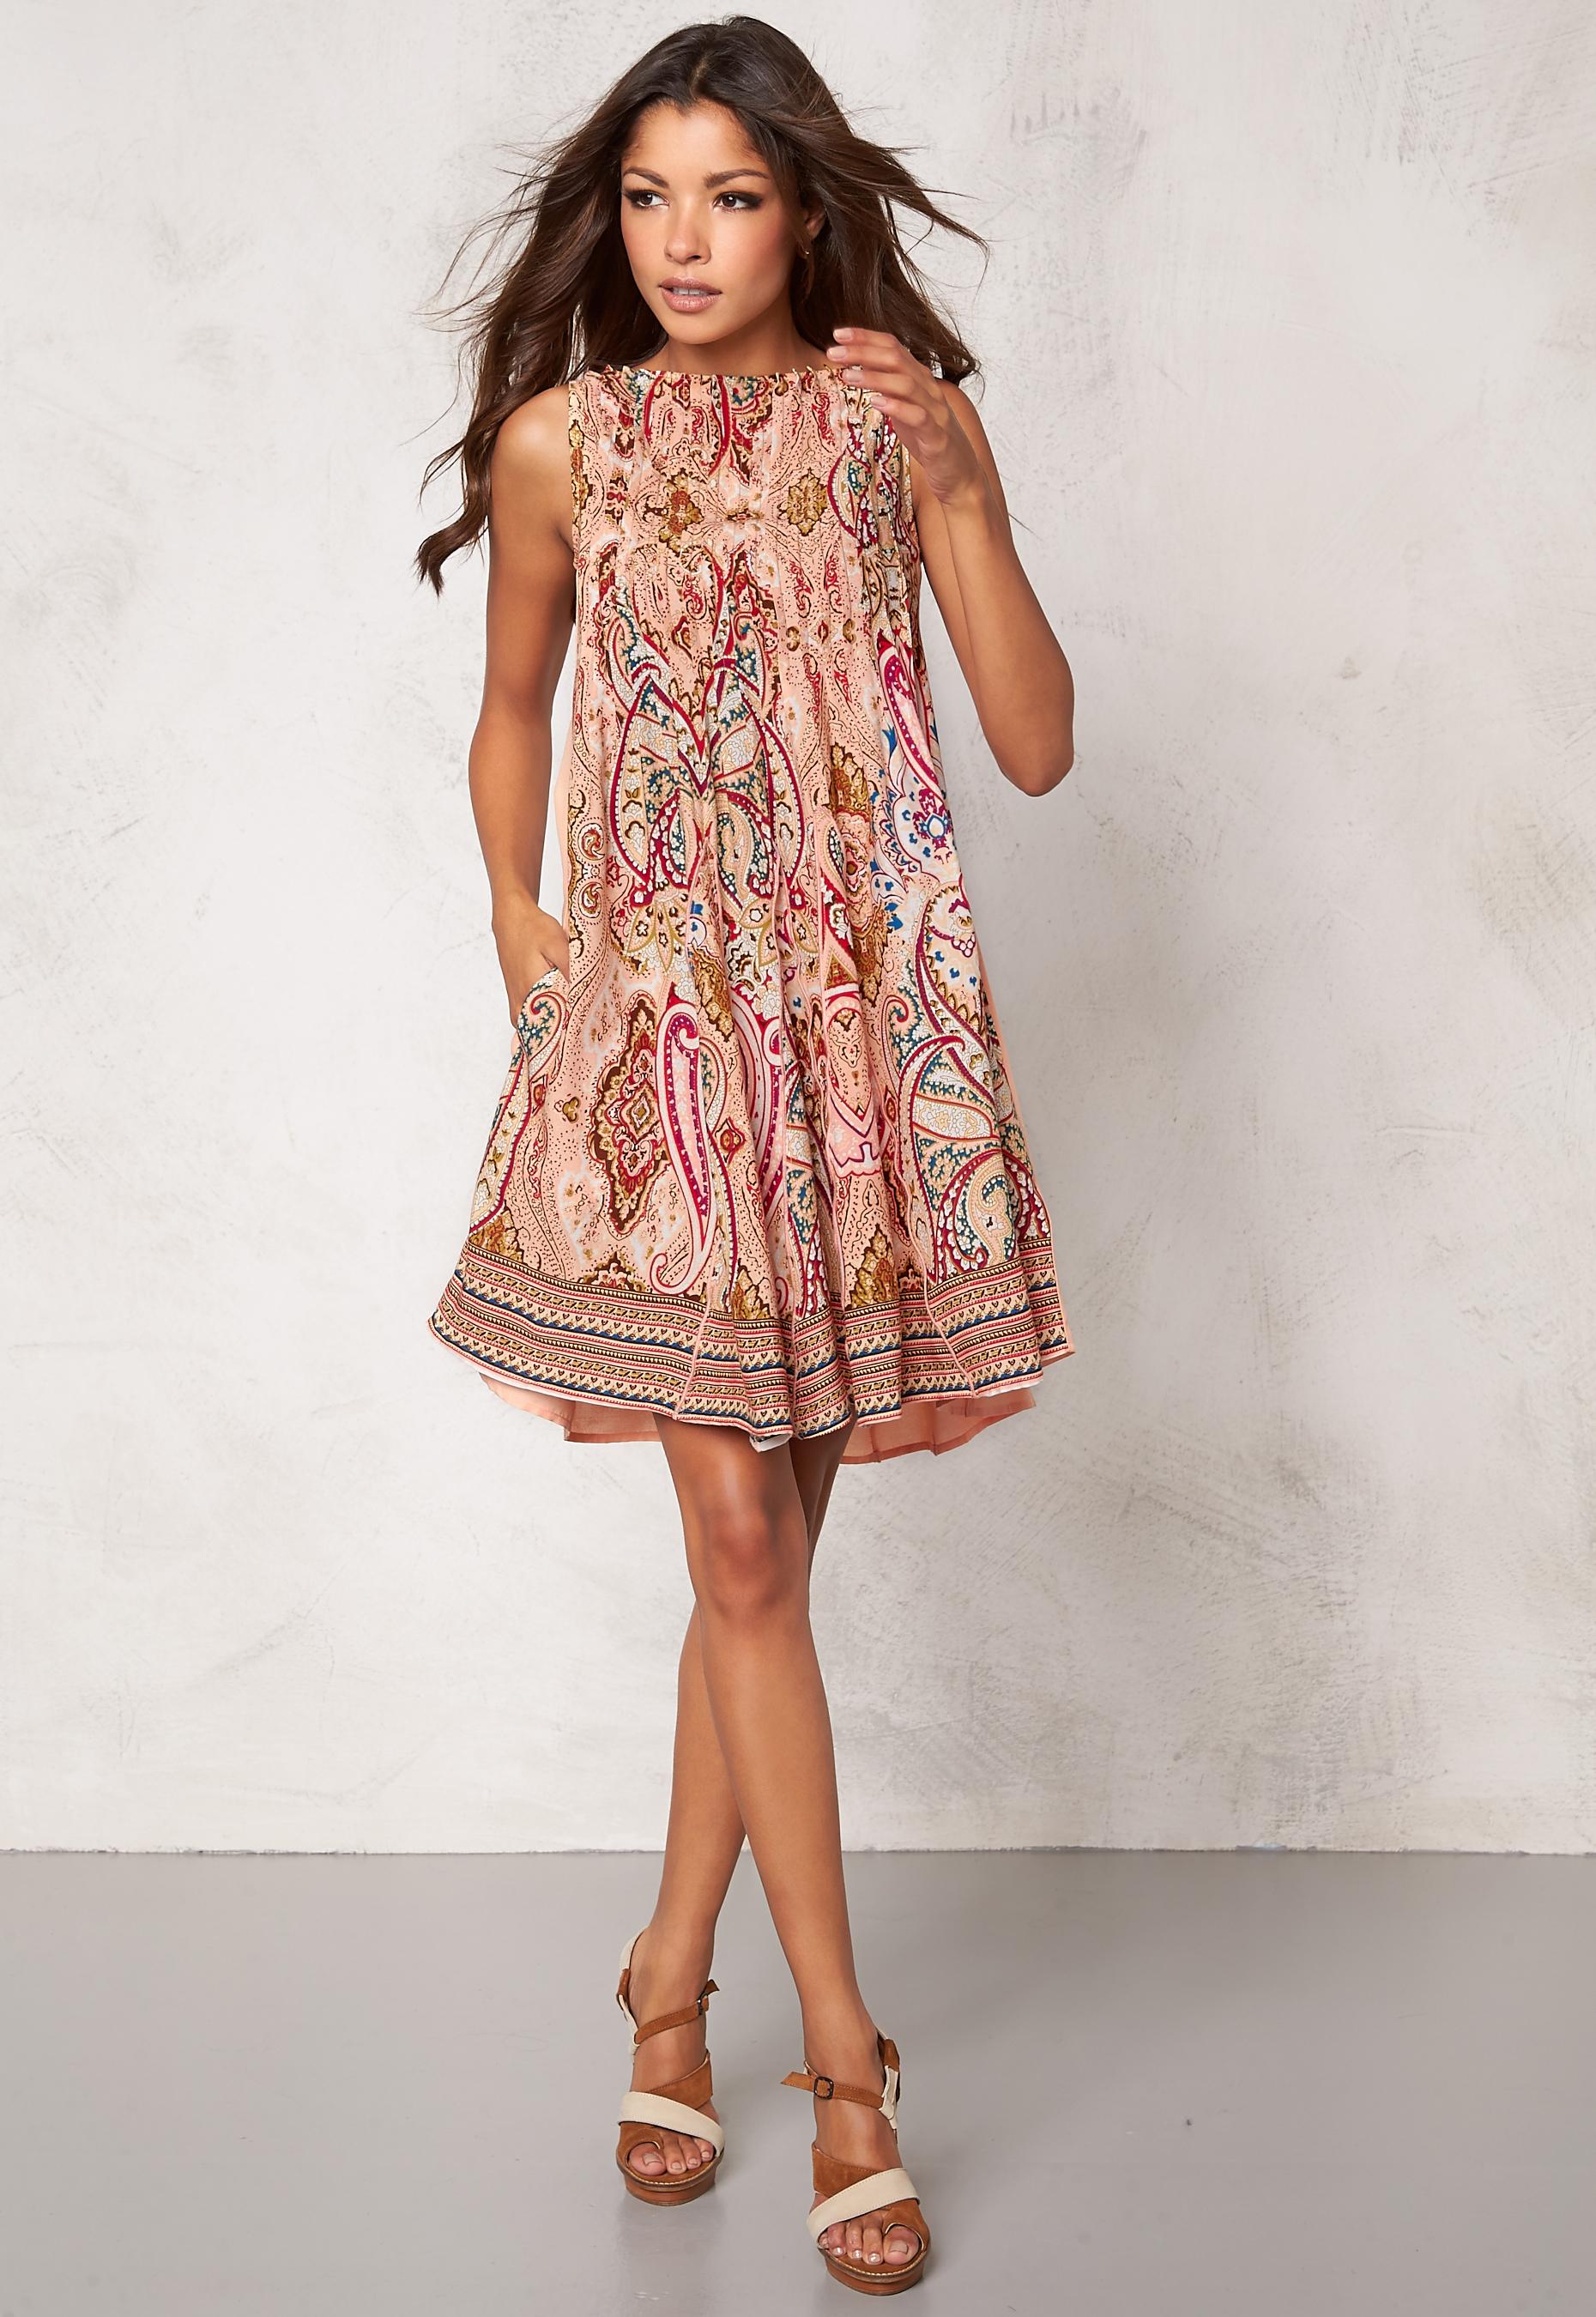 3b91c7e96bd4 Chiara Forthi Giulia Pintuck Dress Patterned / Light powder pink ...